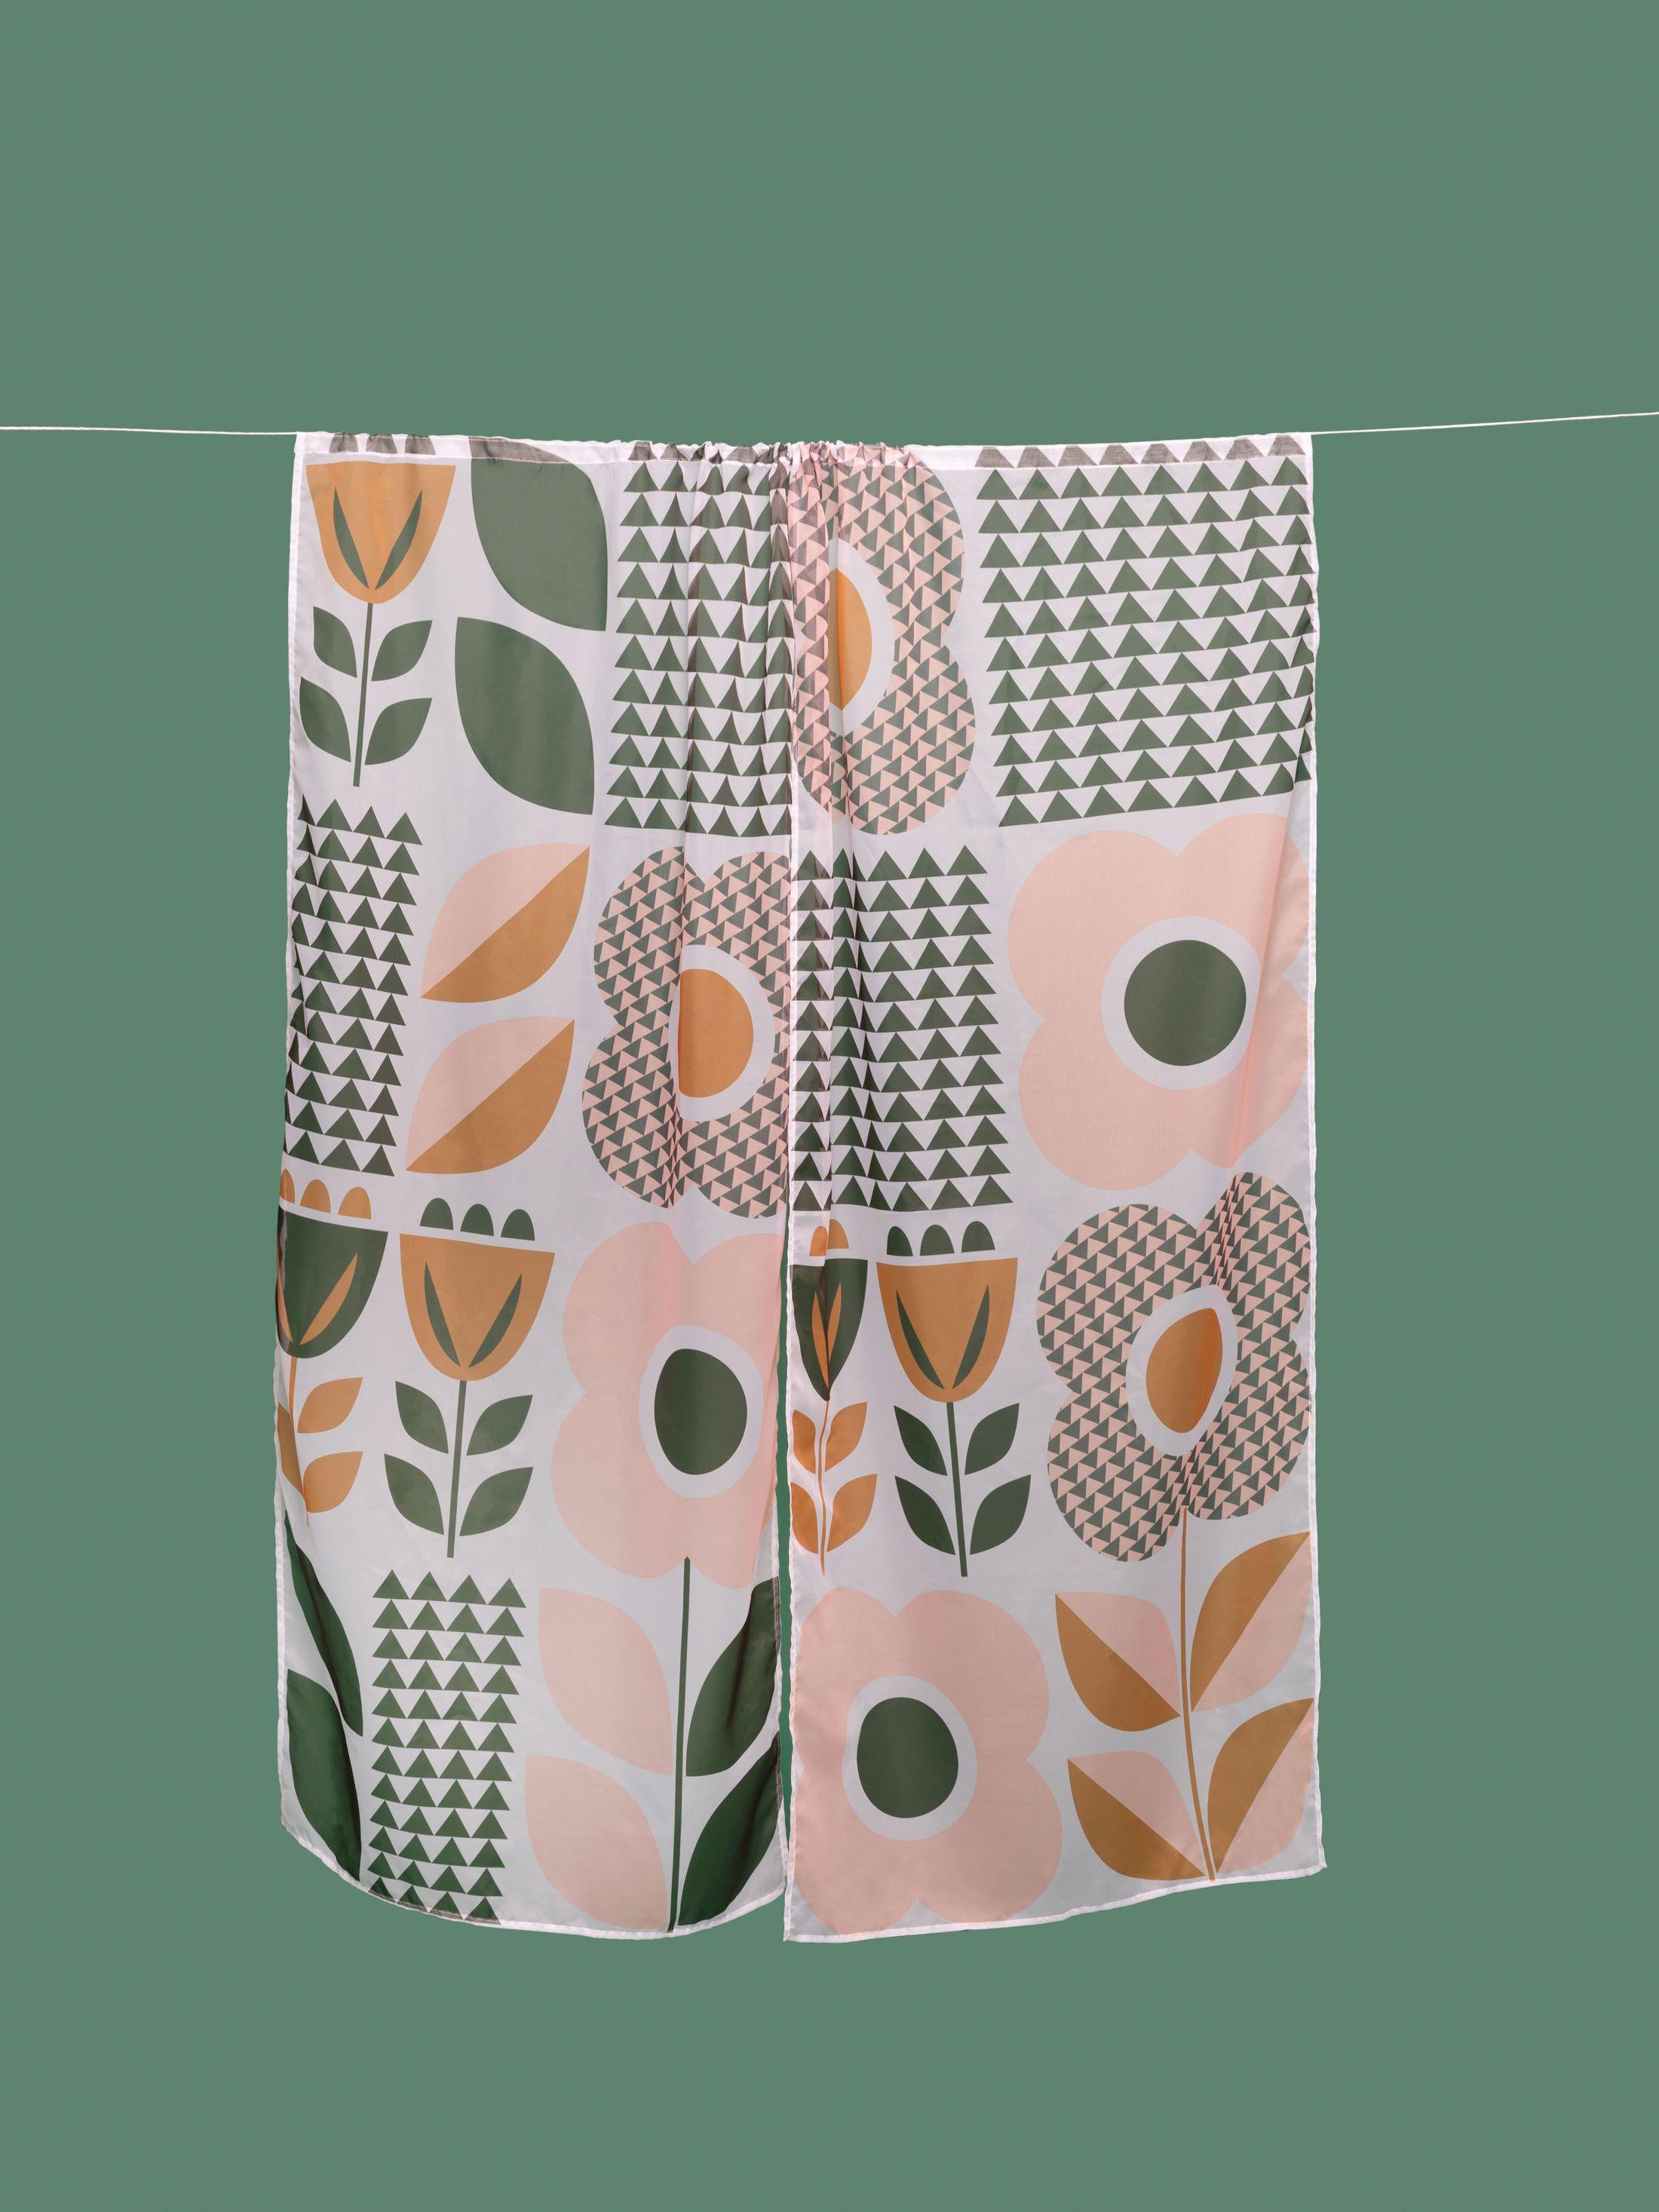 net curtains hemming details